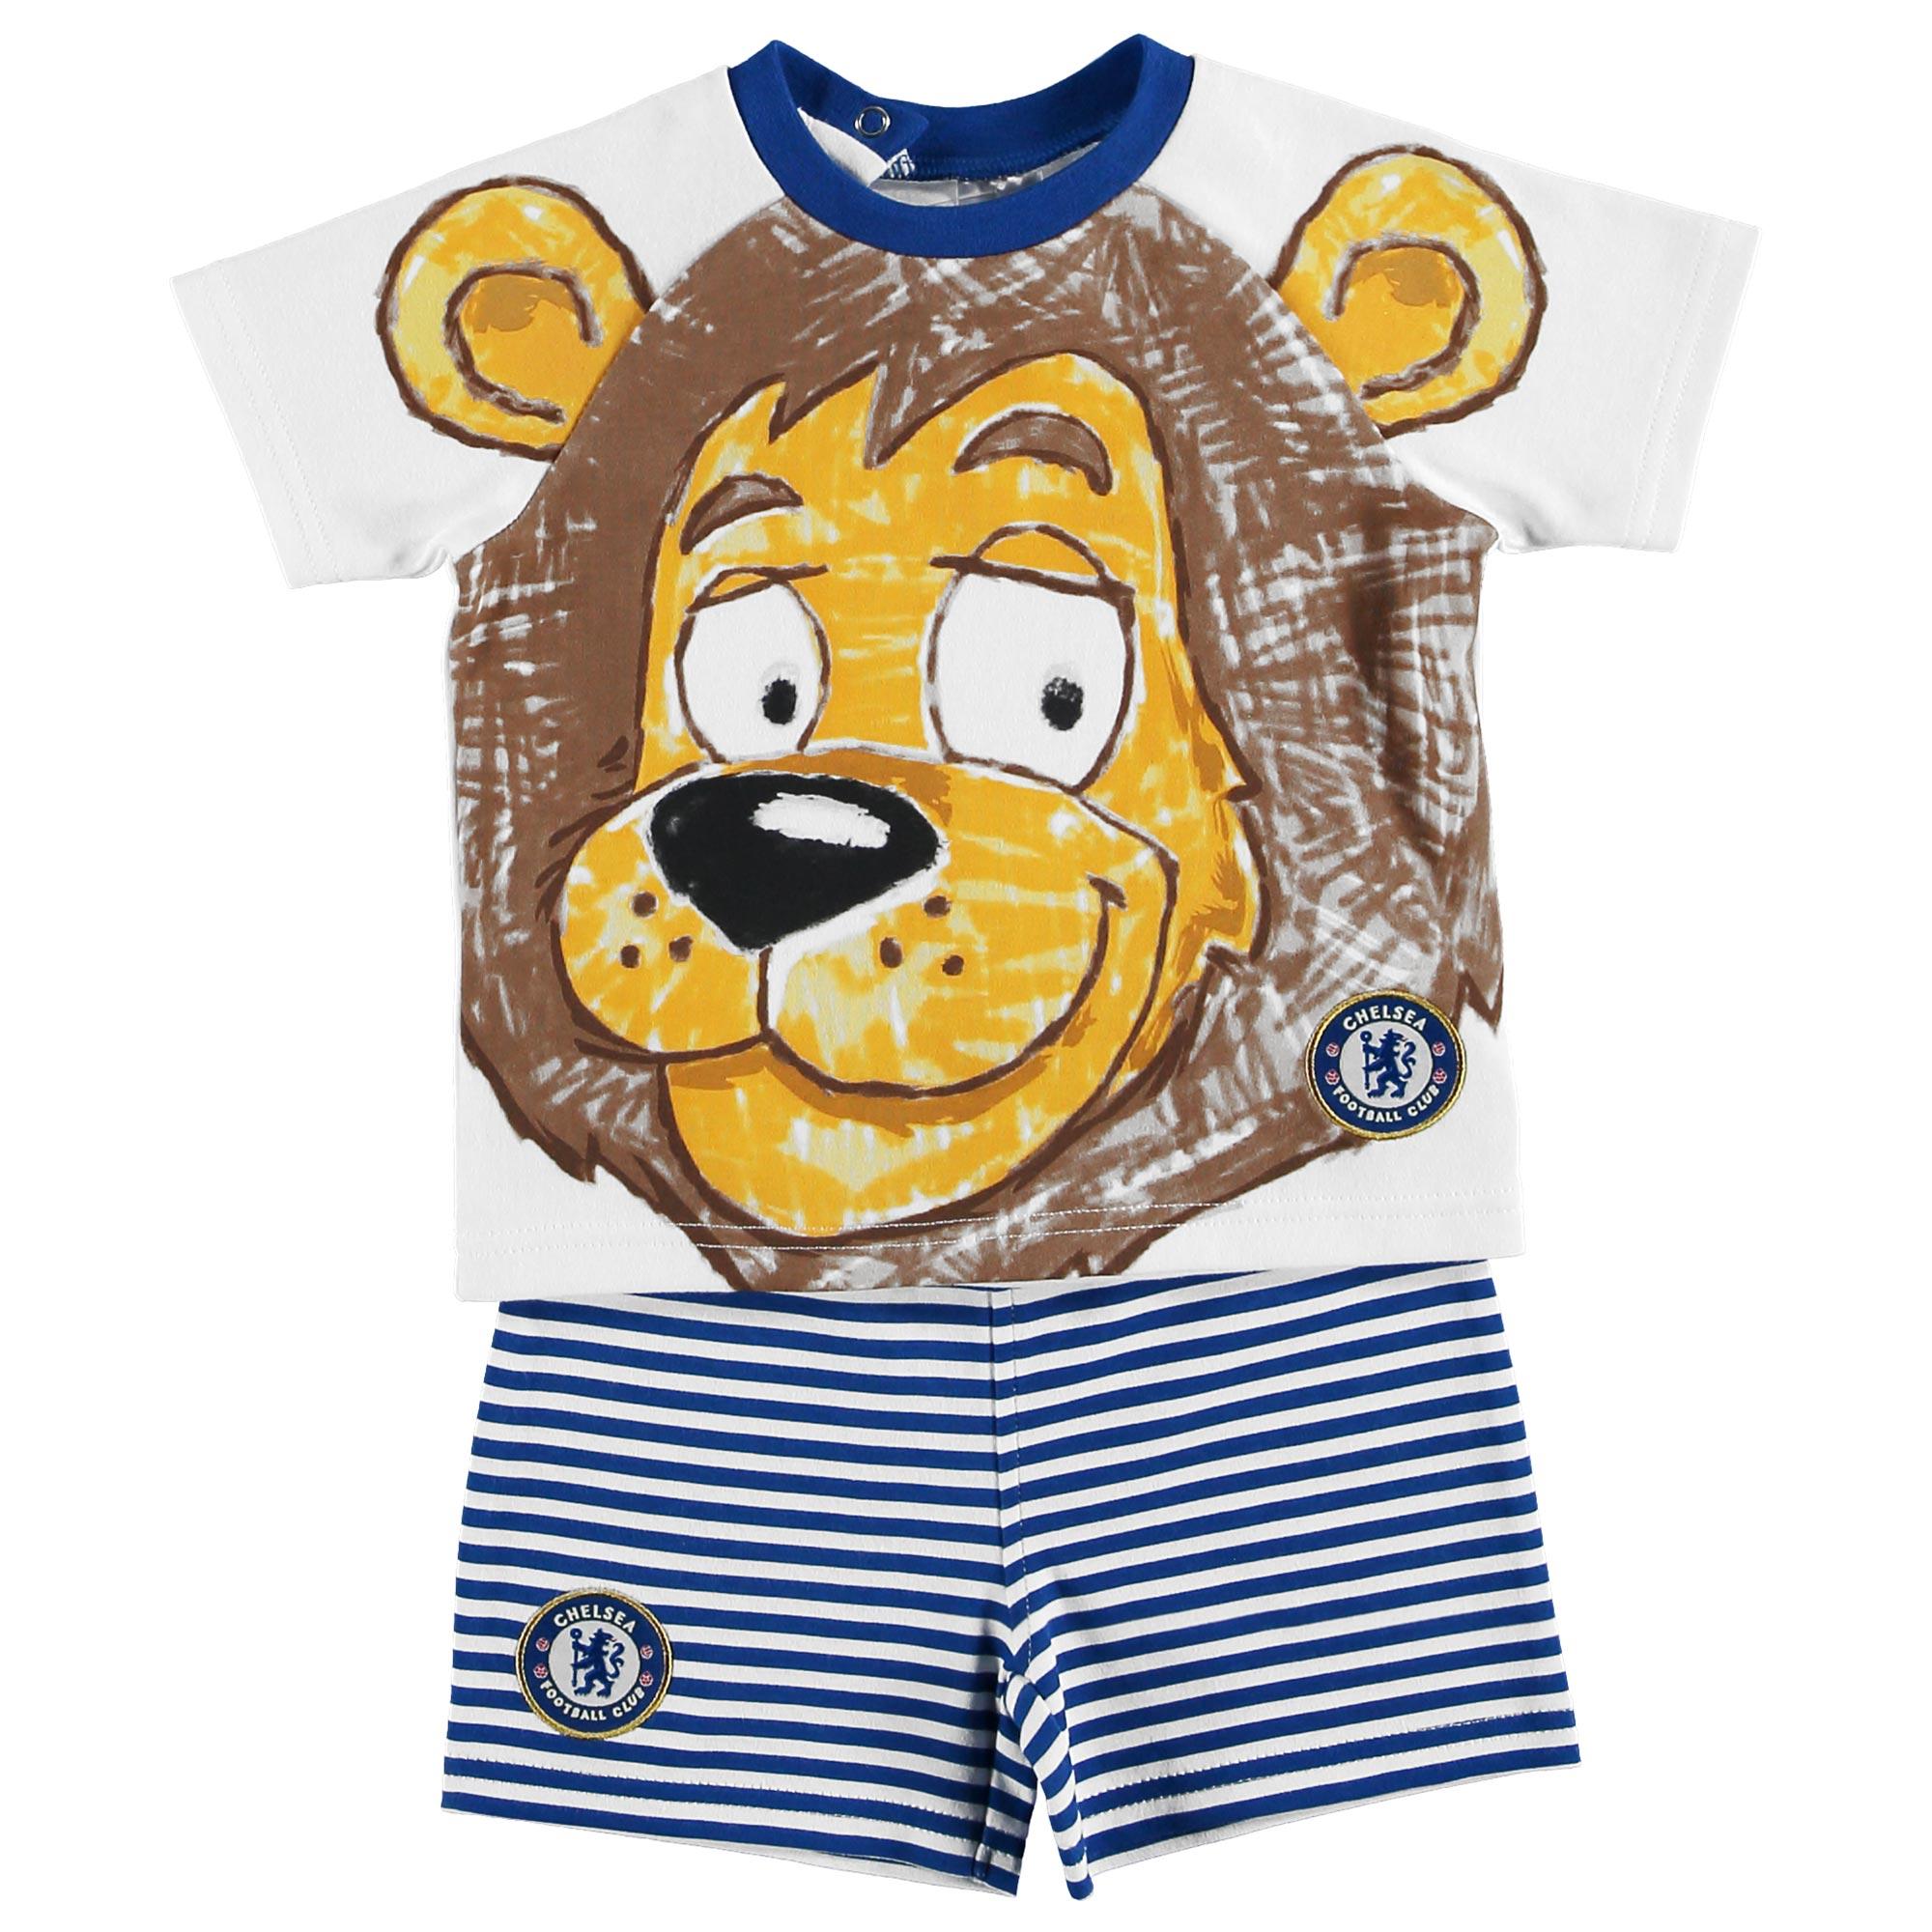 Chelsea Stamford Short & T-Shirt Set - Royal - Baby